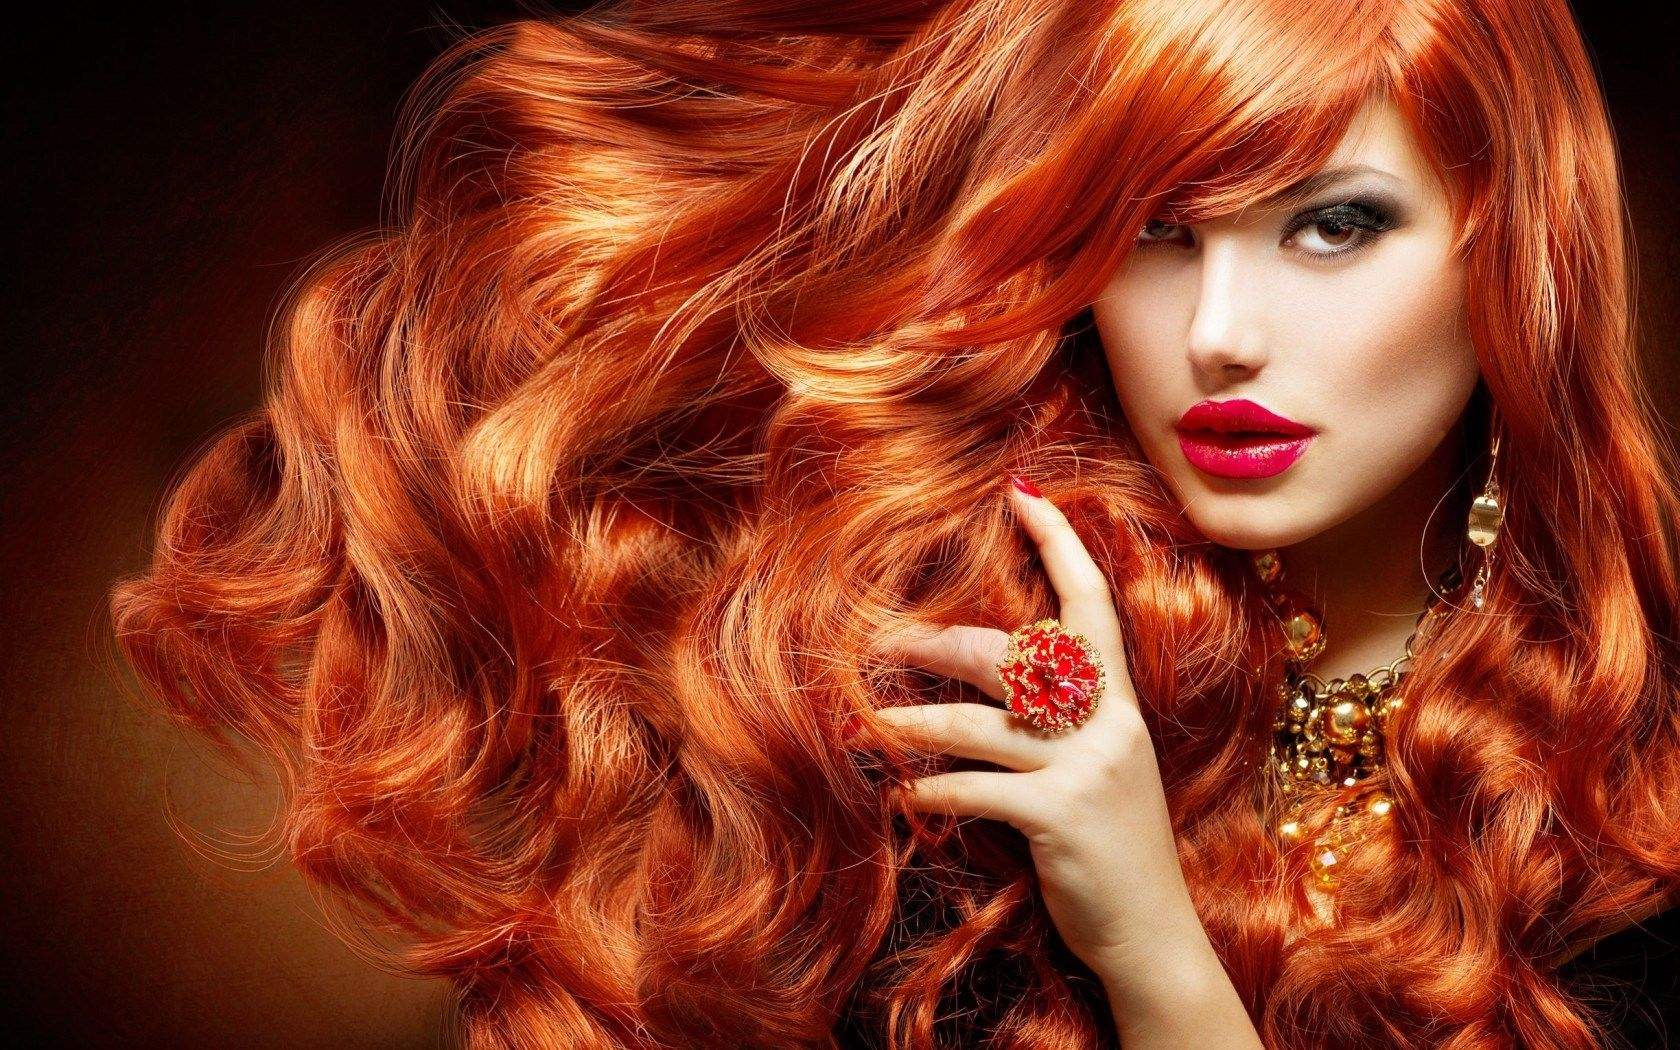 Fashion Earrings Redhead HD Wallpaper